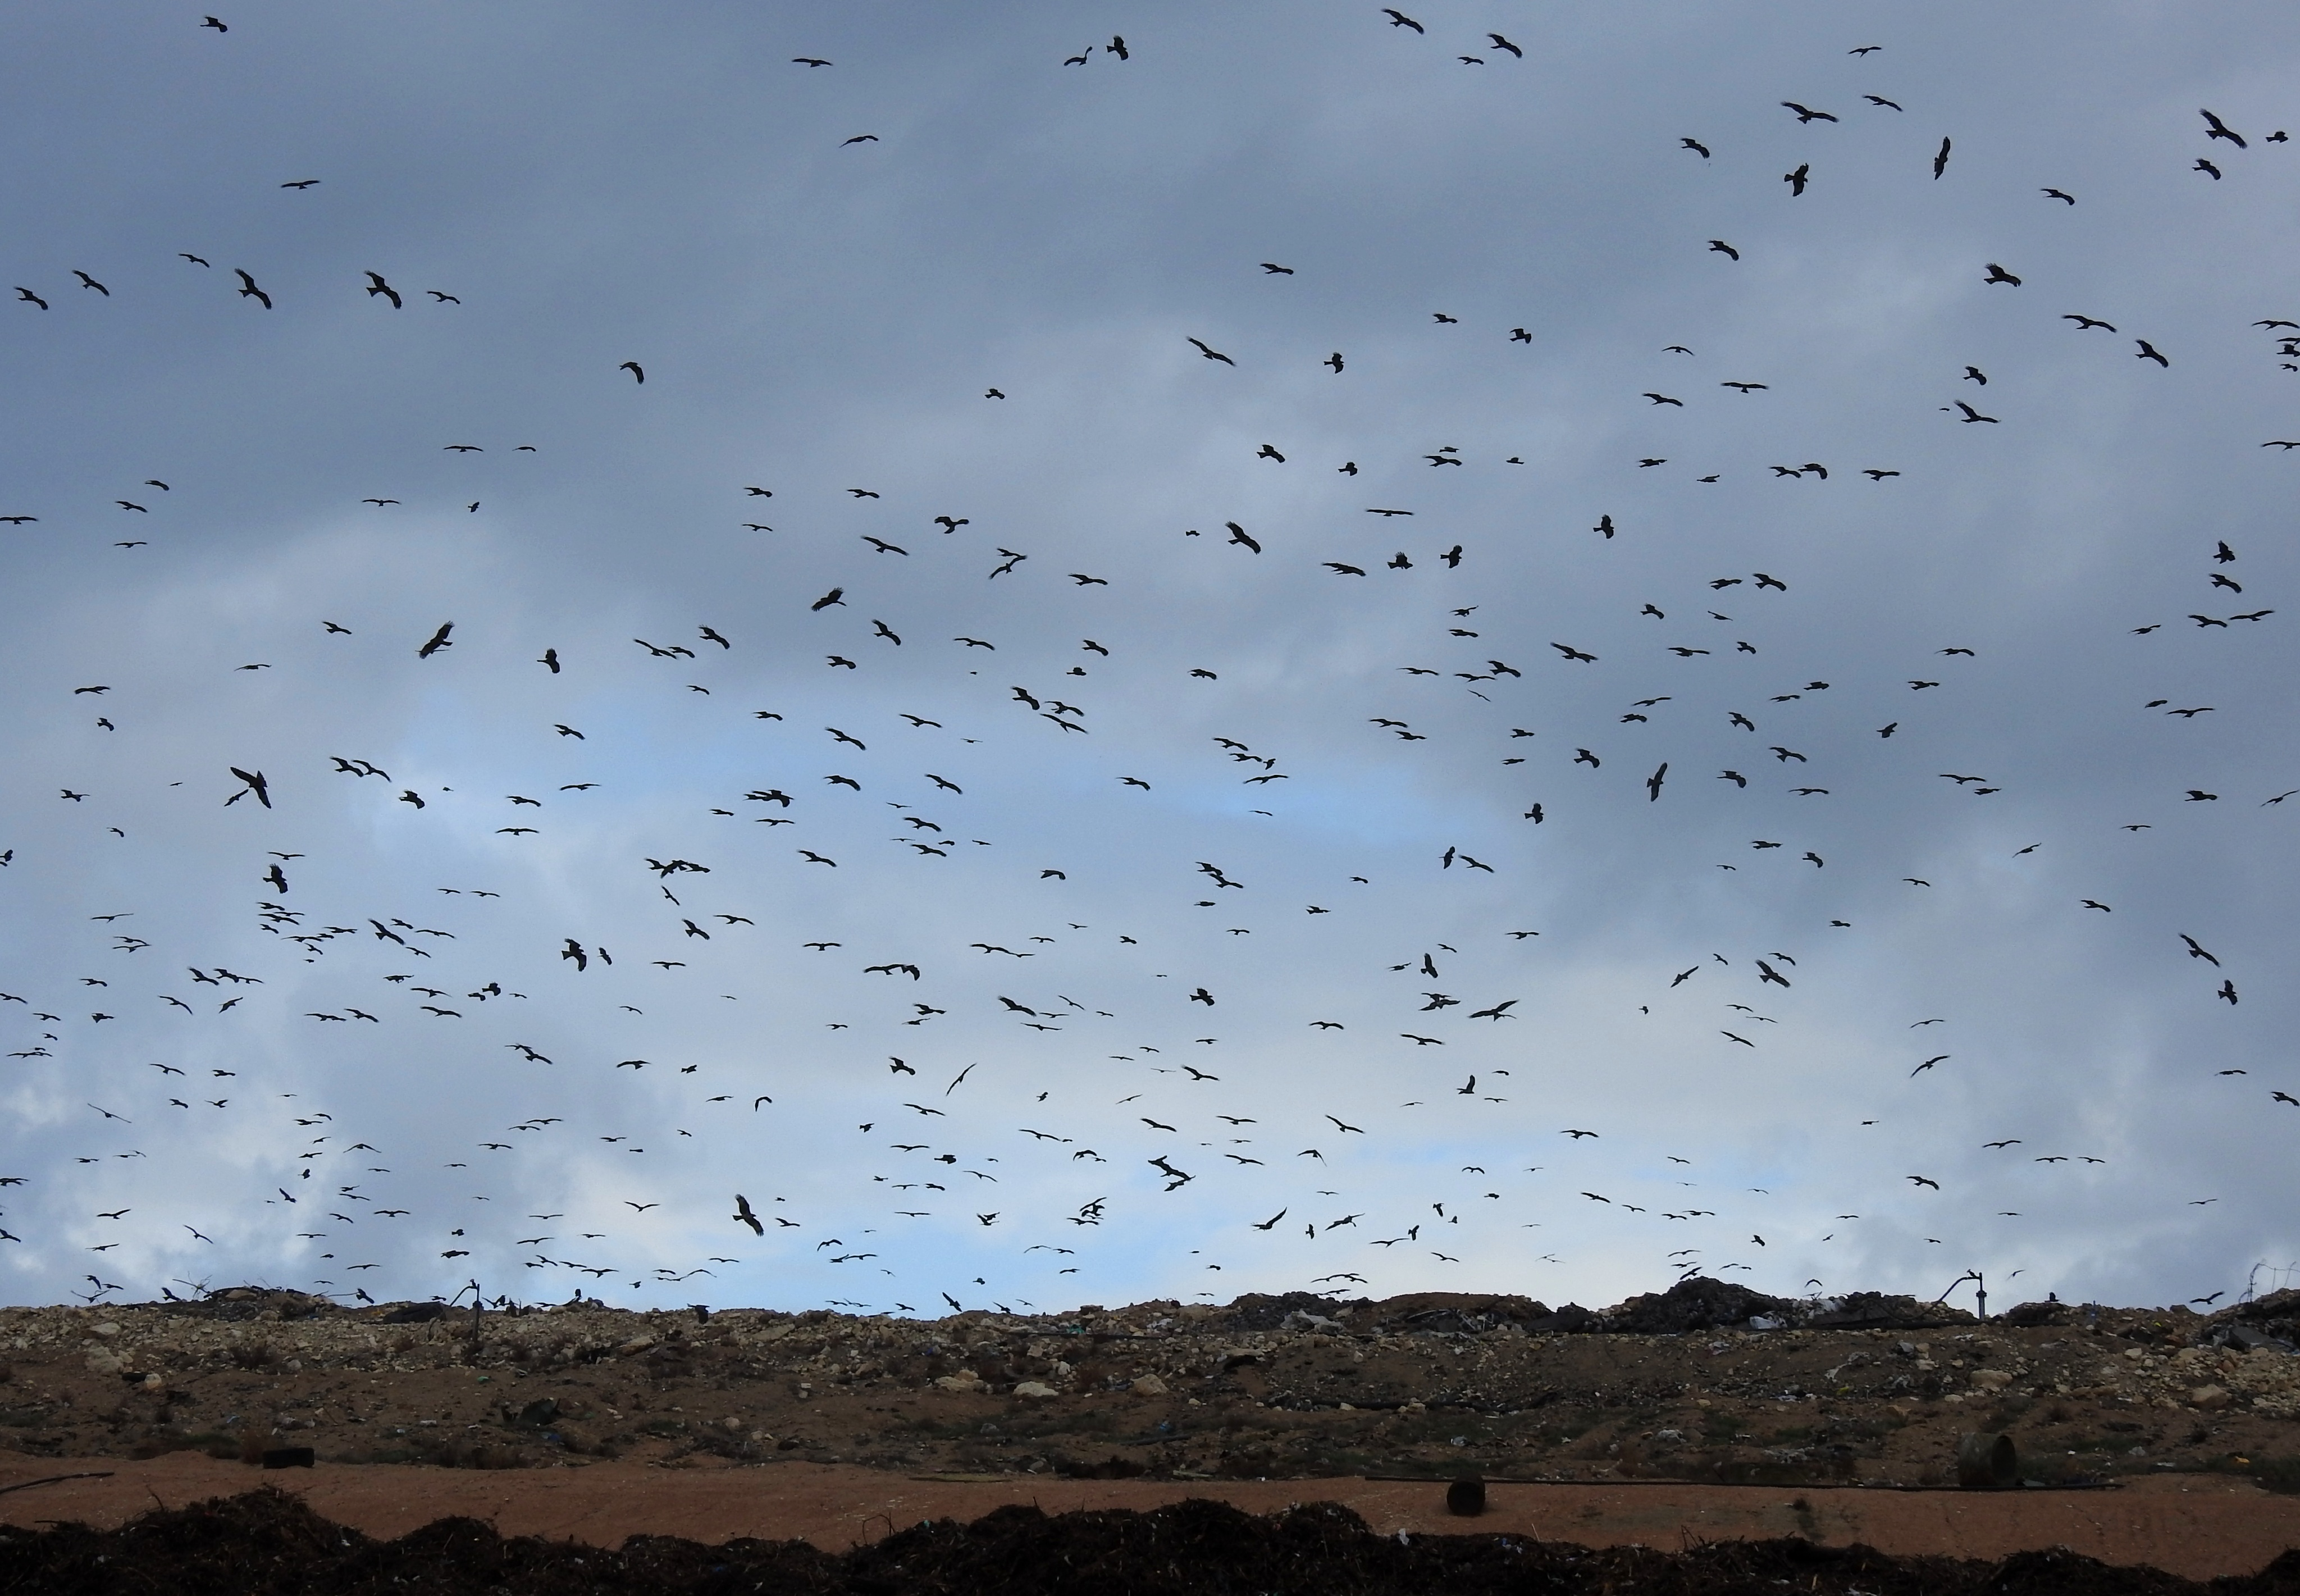 Black kites swarming over the landfill